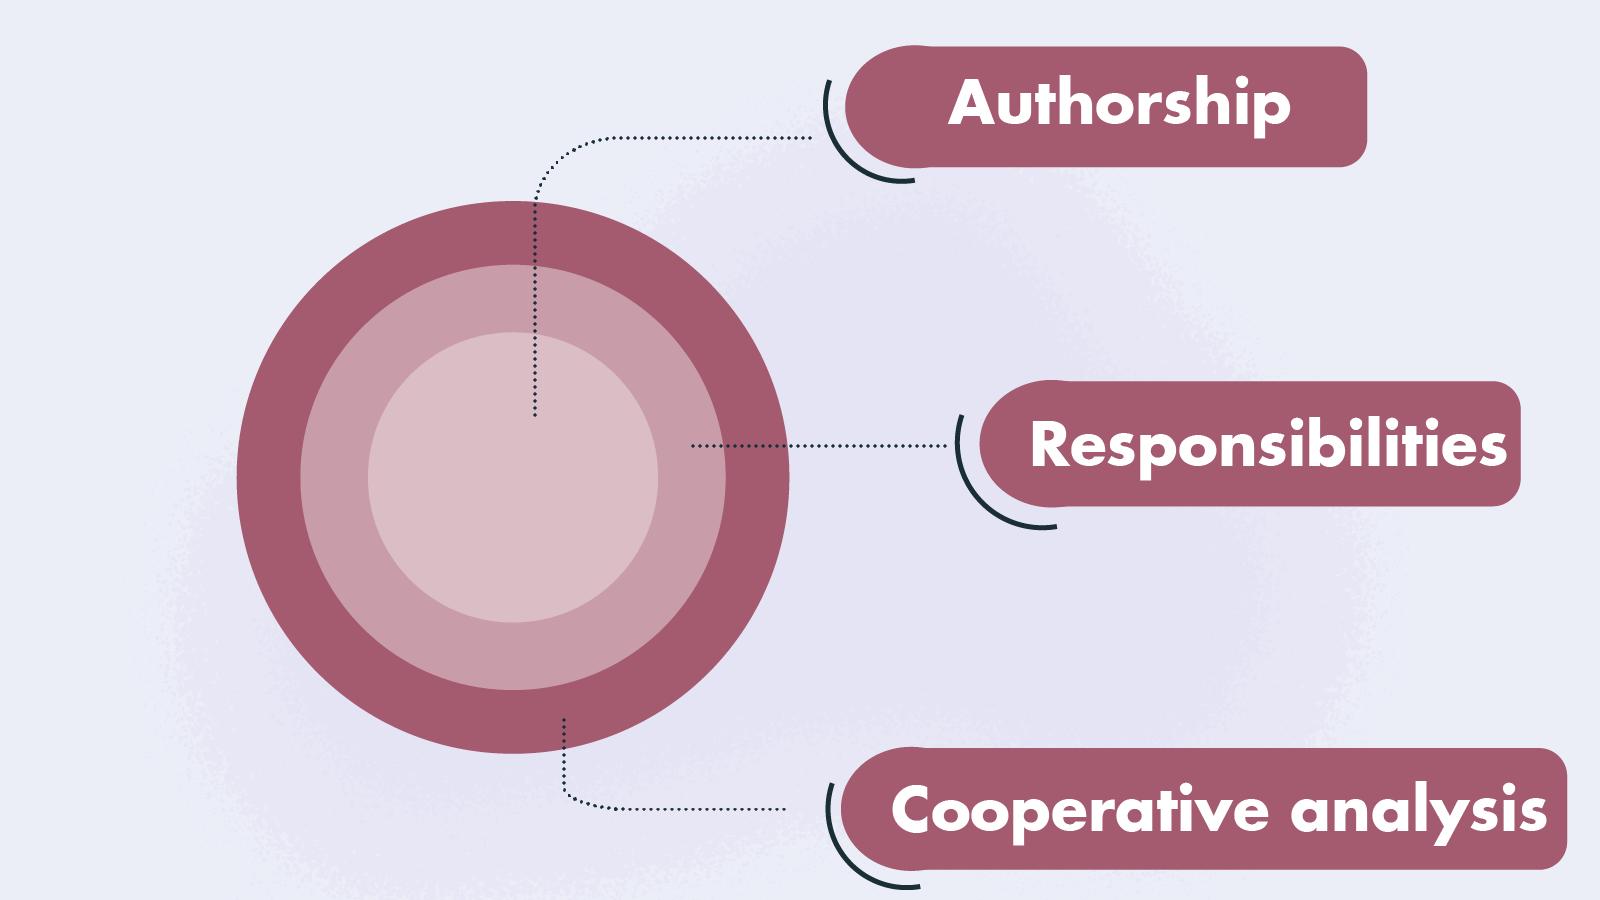 Authorship, Responsibilities, Cooperative analysis